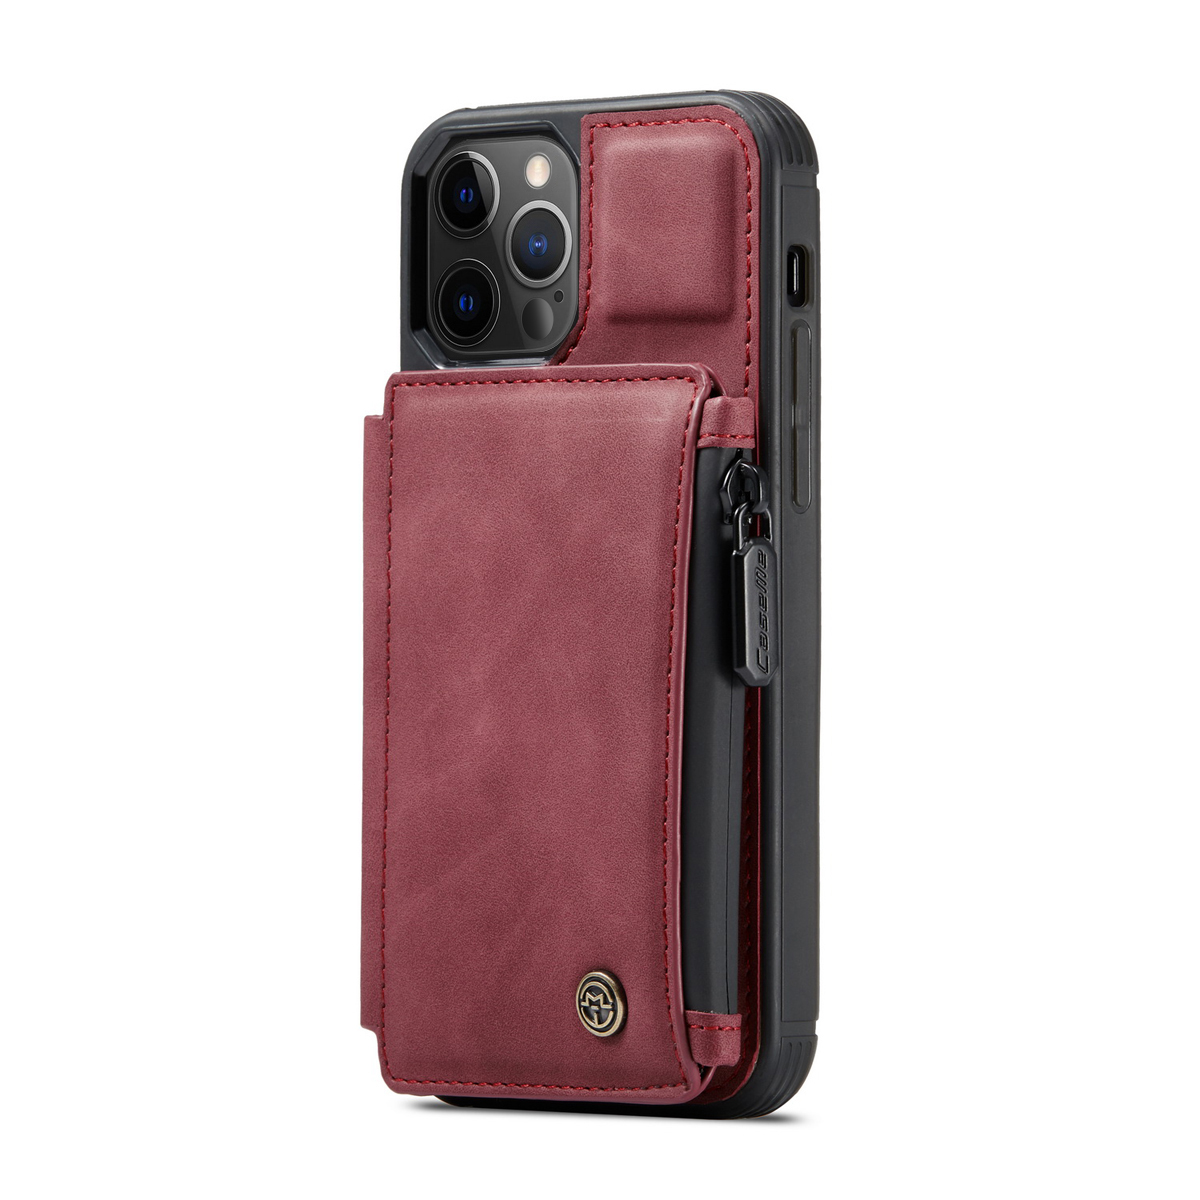 CaseMe C20 Series läderfodral till iPhone 12 Pro Max, röd